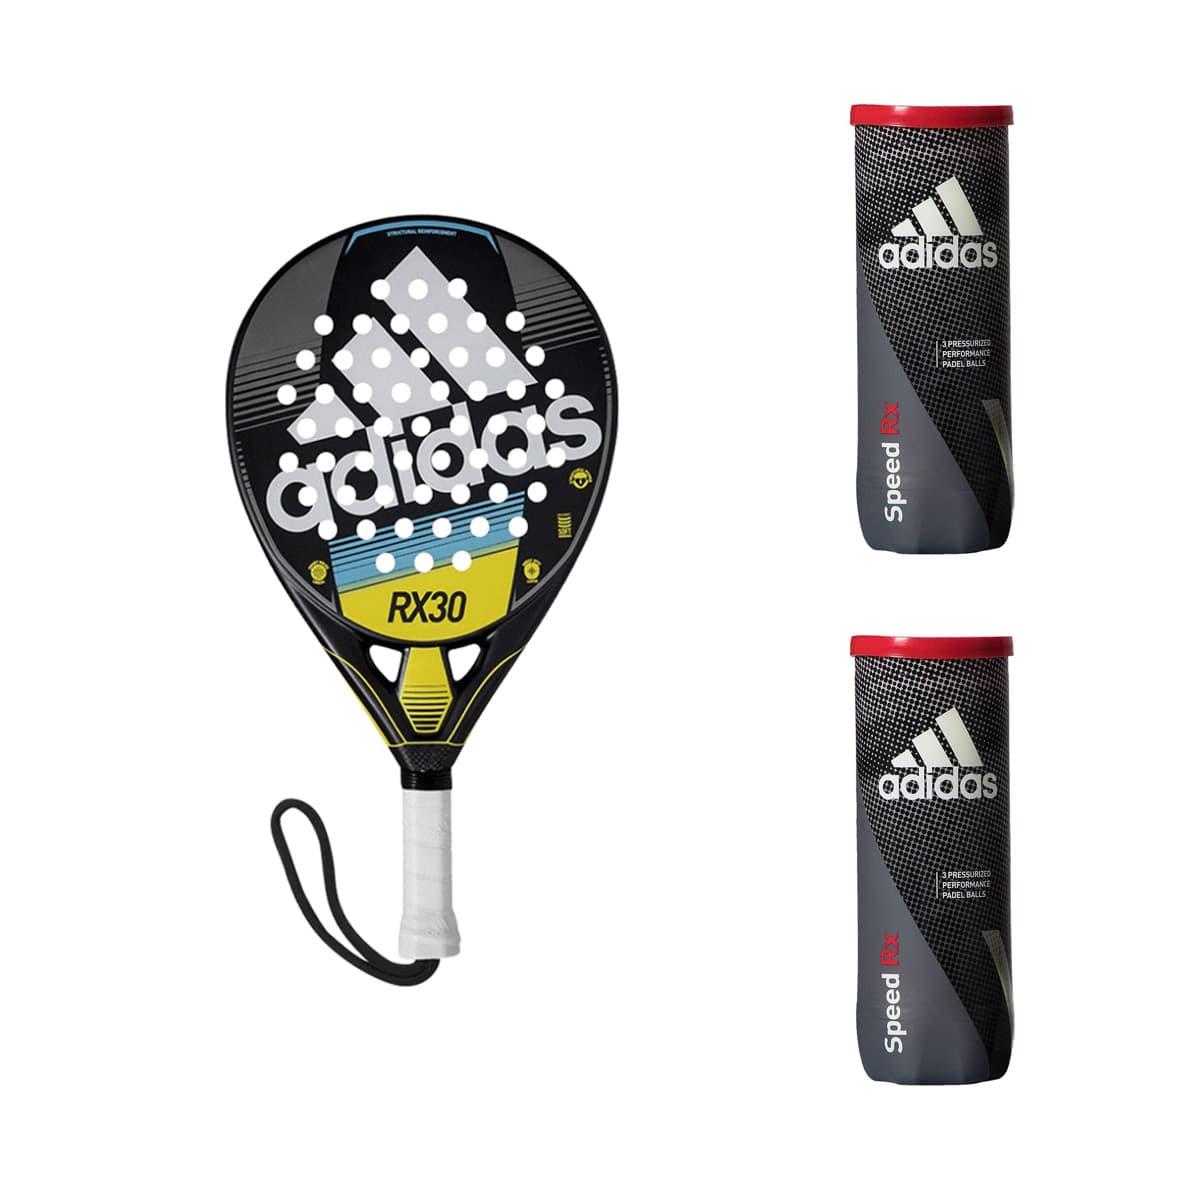 Adidas RX30 paket